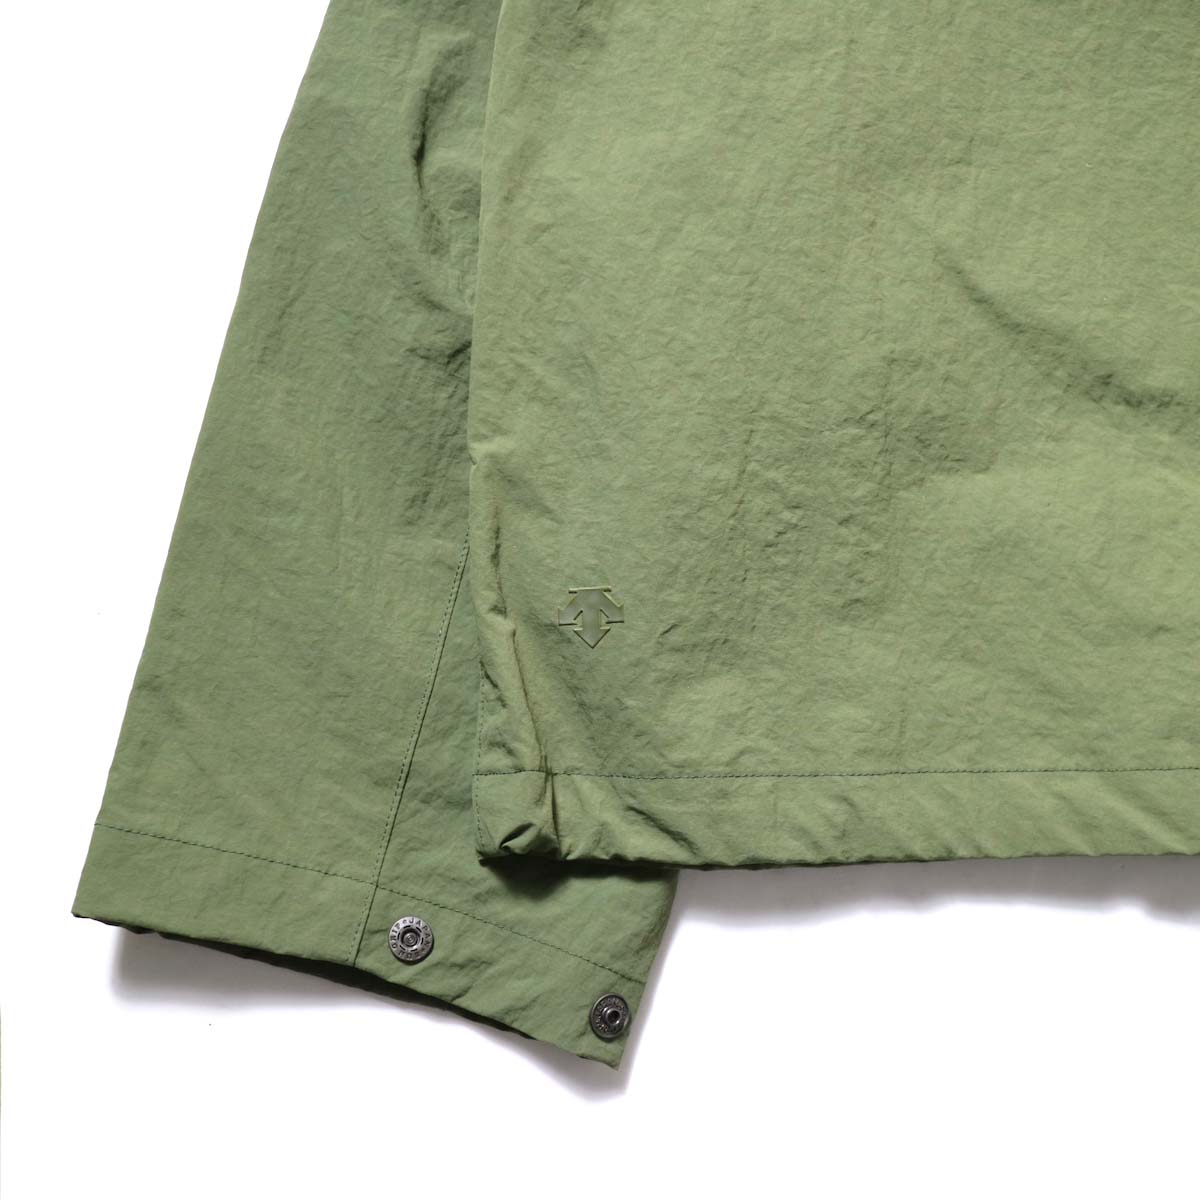 DESCENTE ddd / SWING COACH JACKET (Khaki)背面ロゴ、袖ボタン